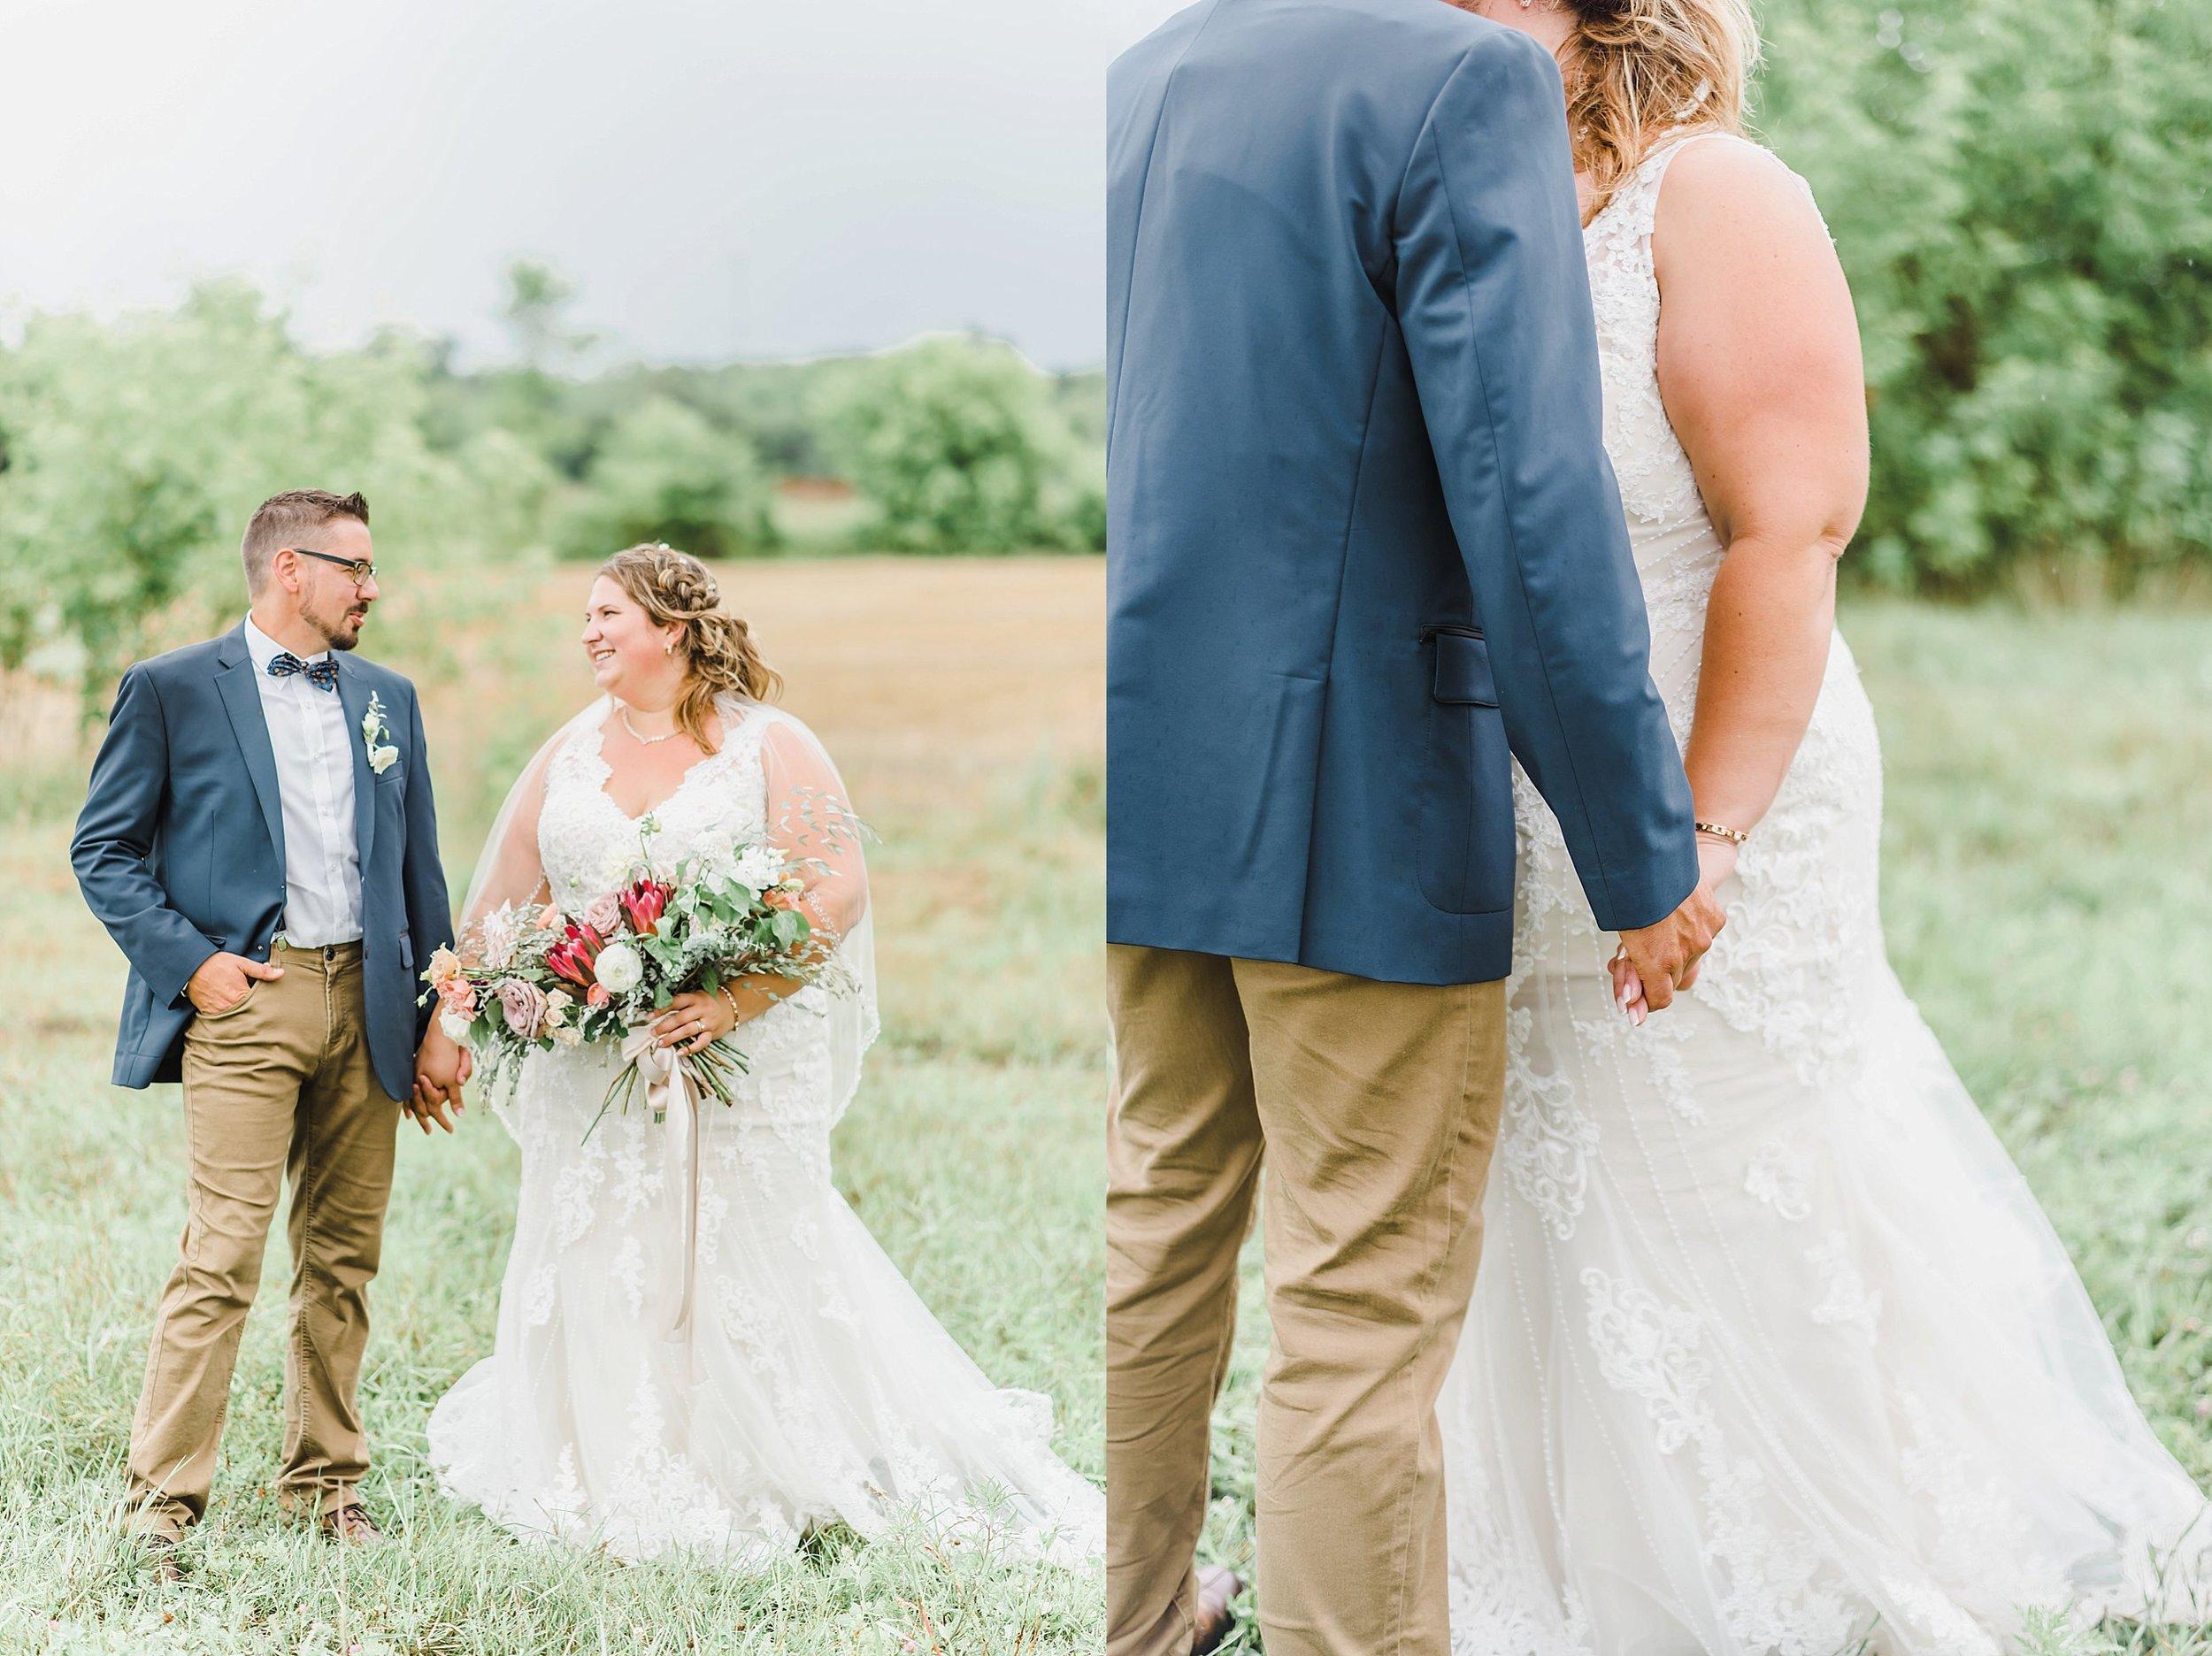 light airy indie fine art ottawa wedding photographer | Ali and Batoul Photography_0410.jpg